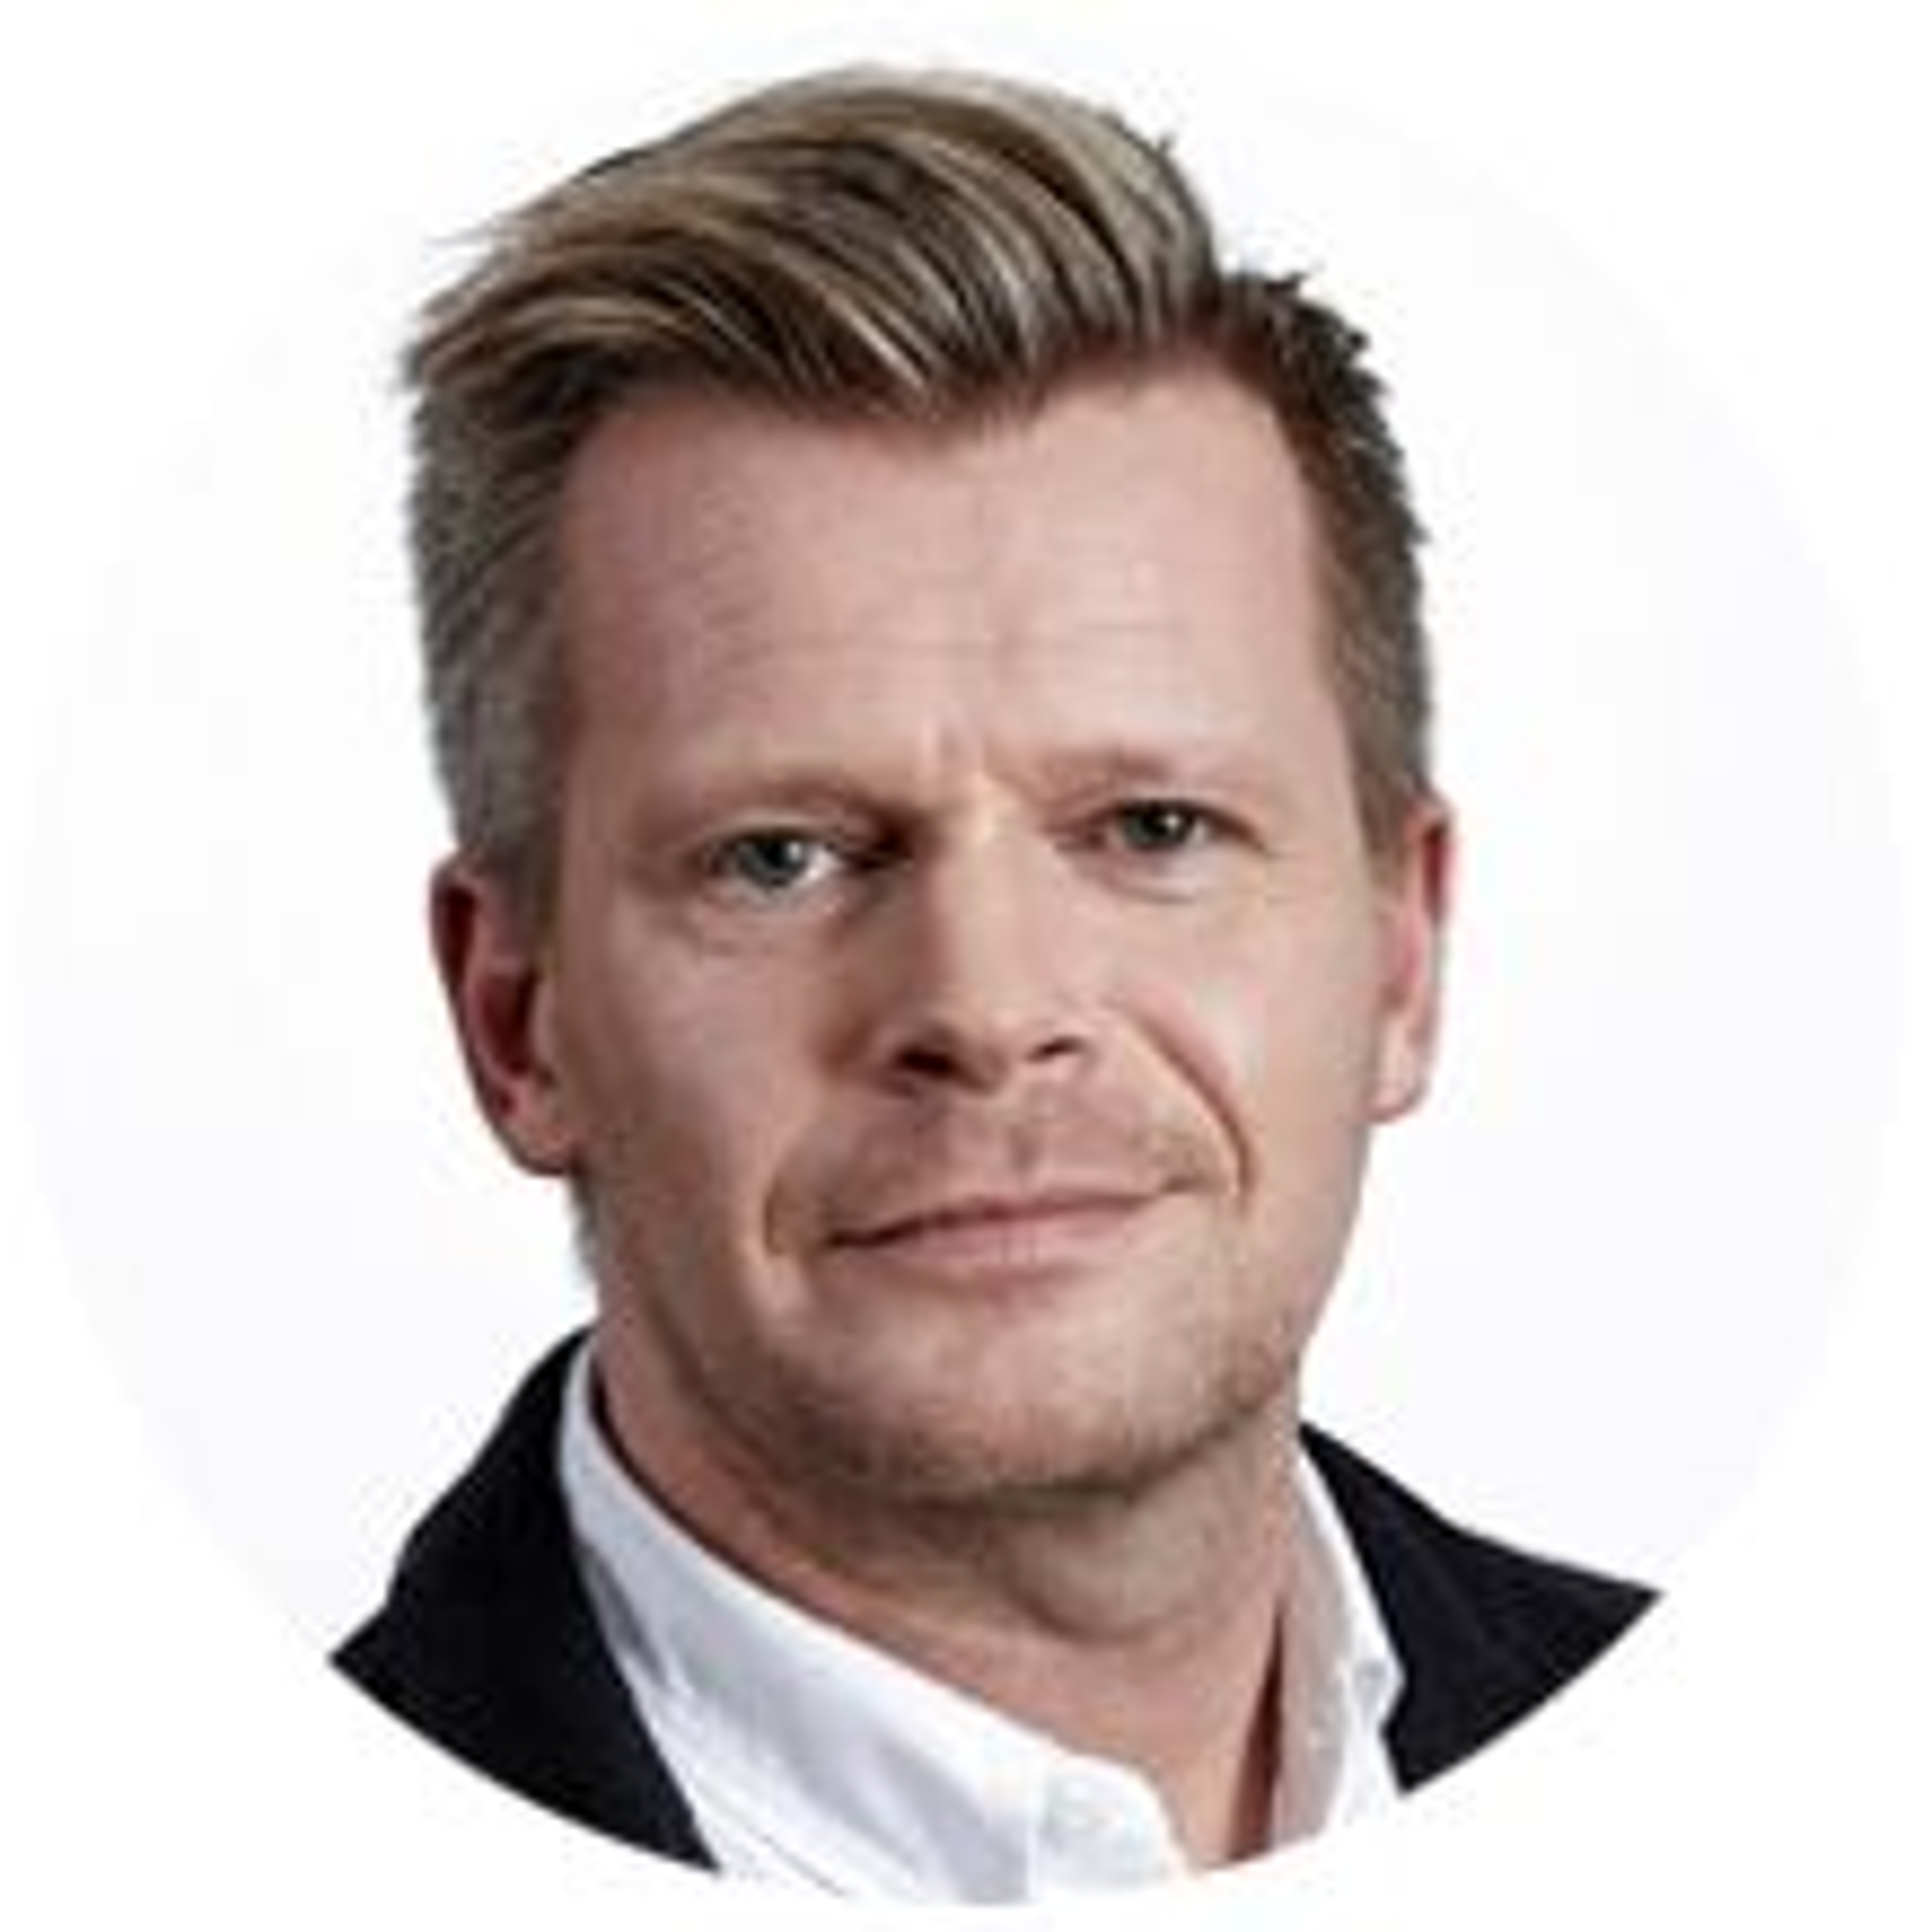 Christian Brosstad